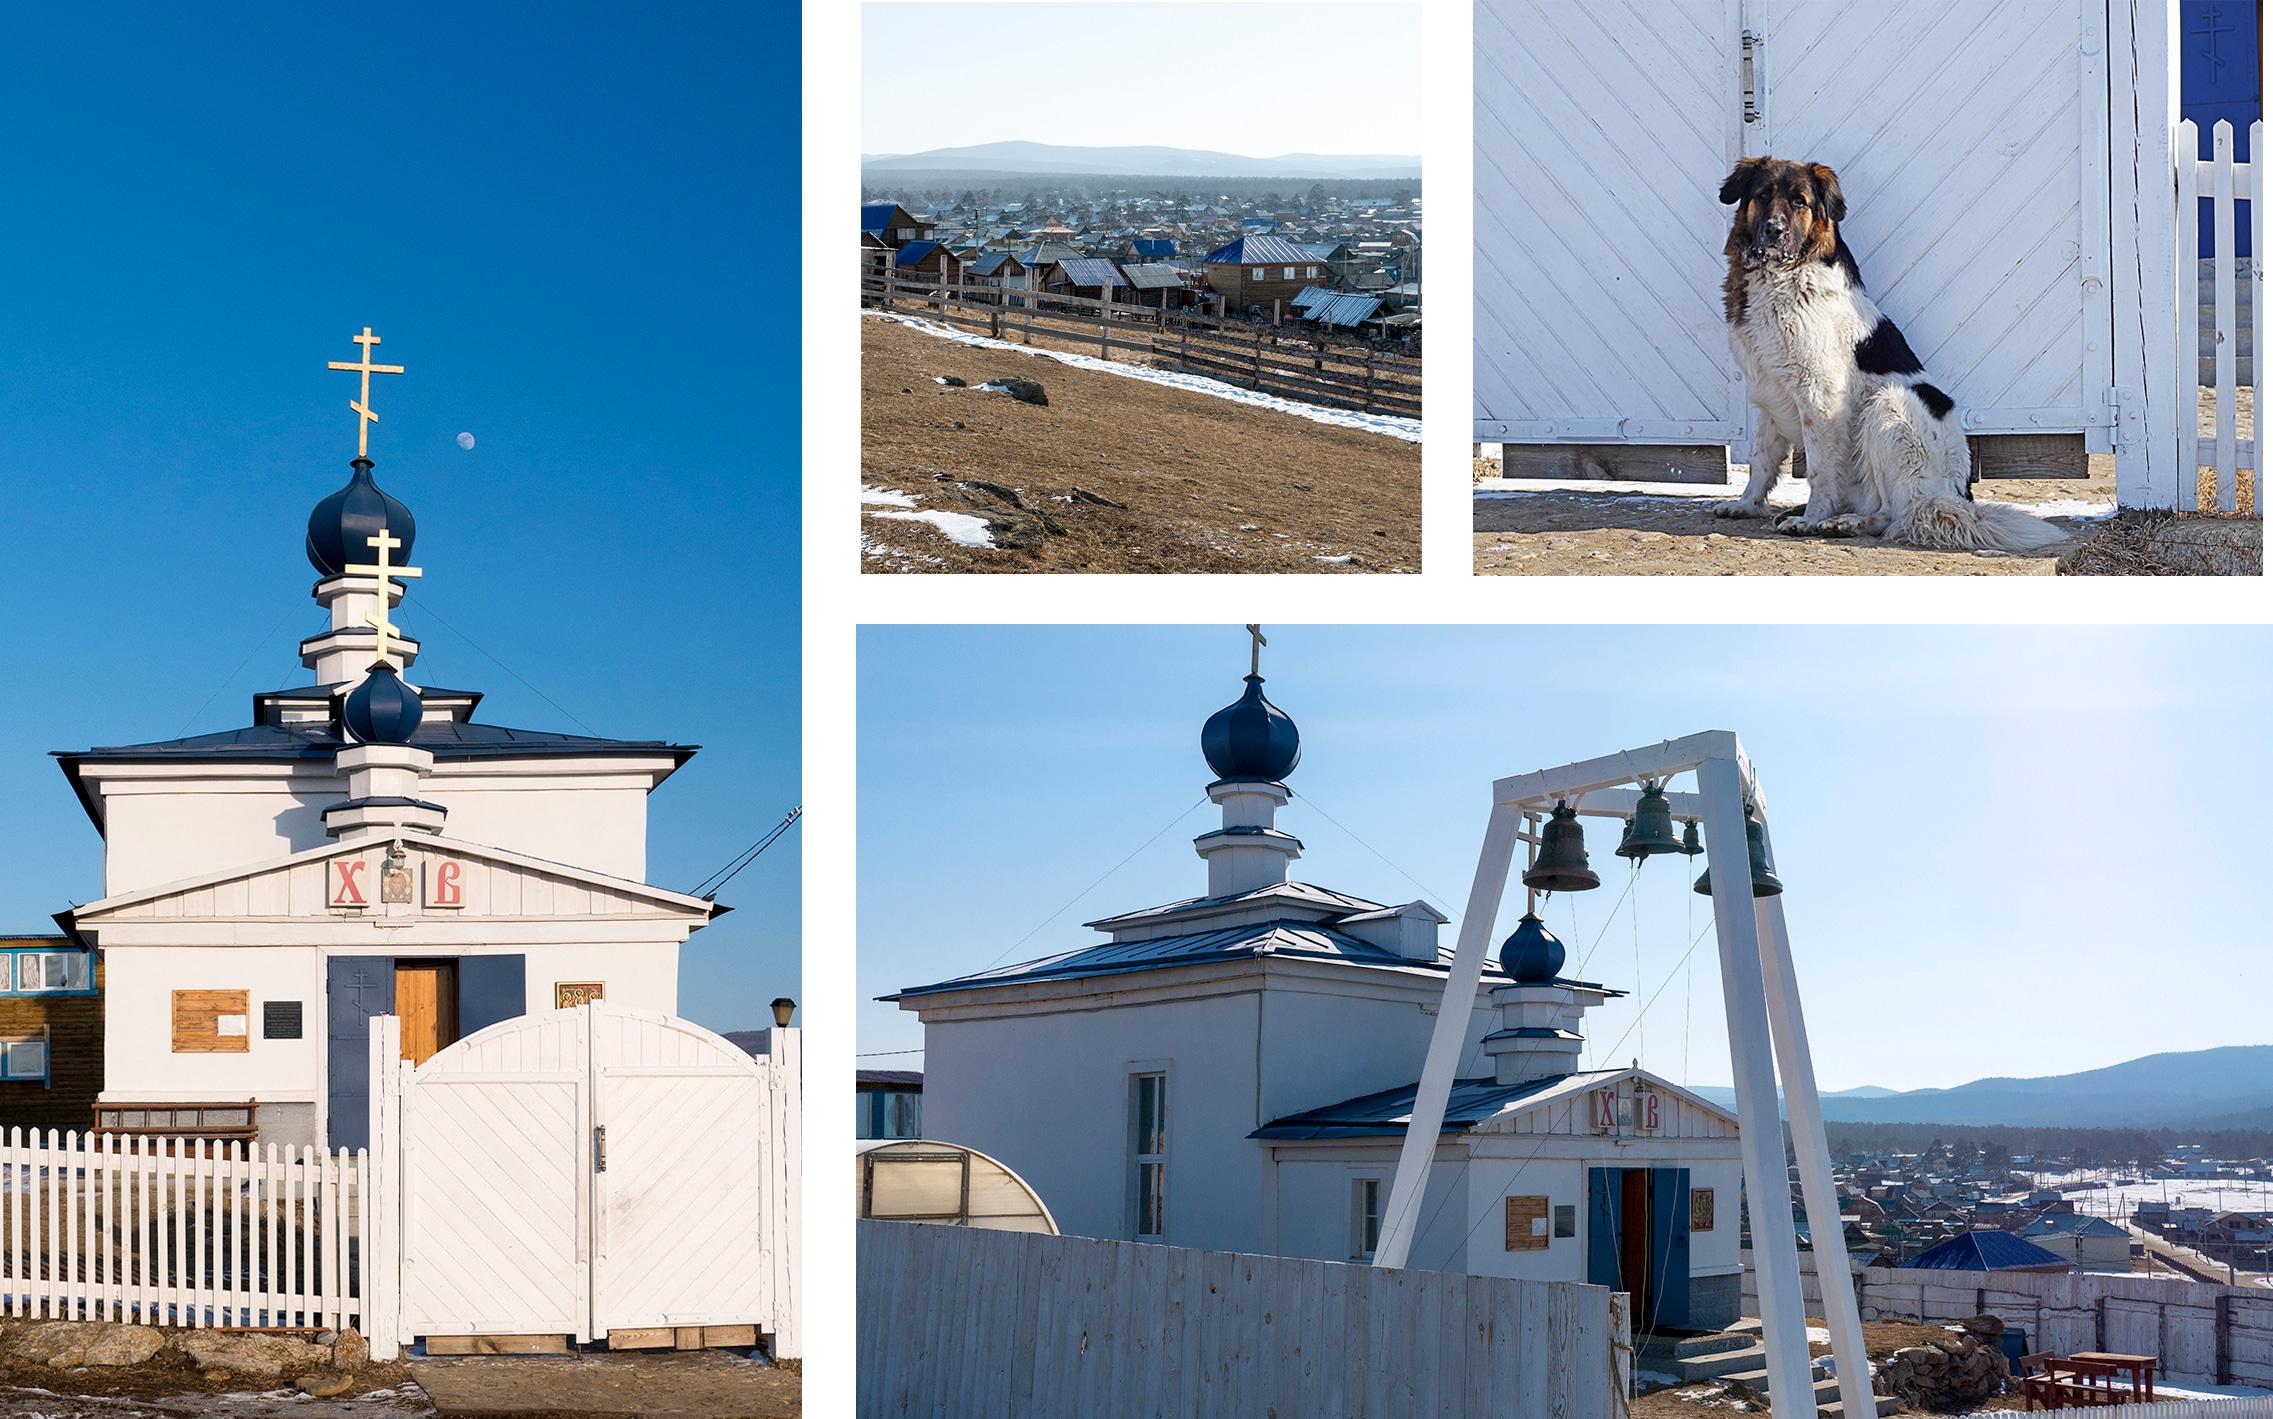 Eglise Khuzir ciel bleu chien cloches neige